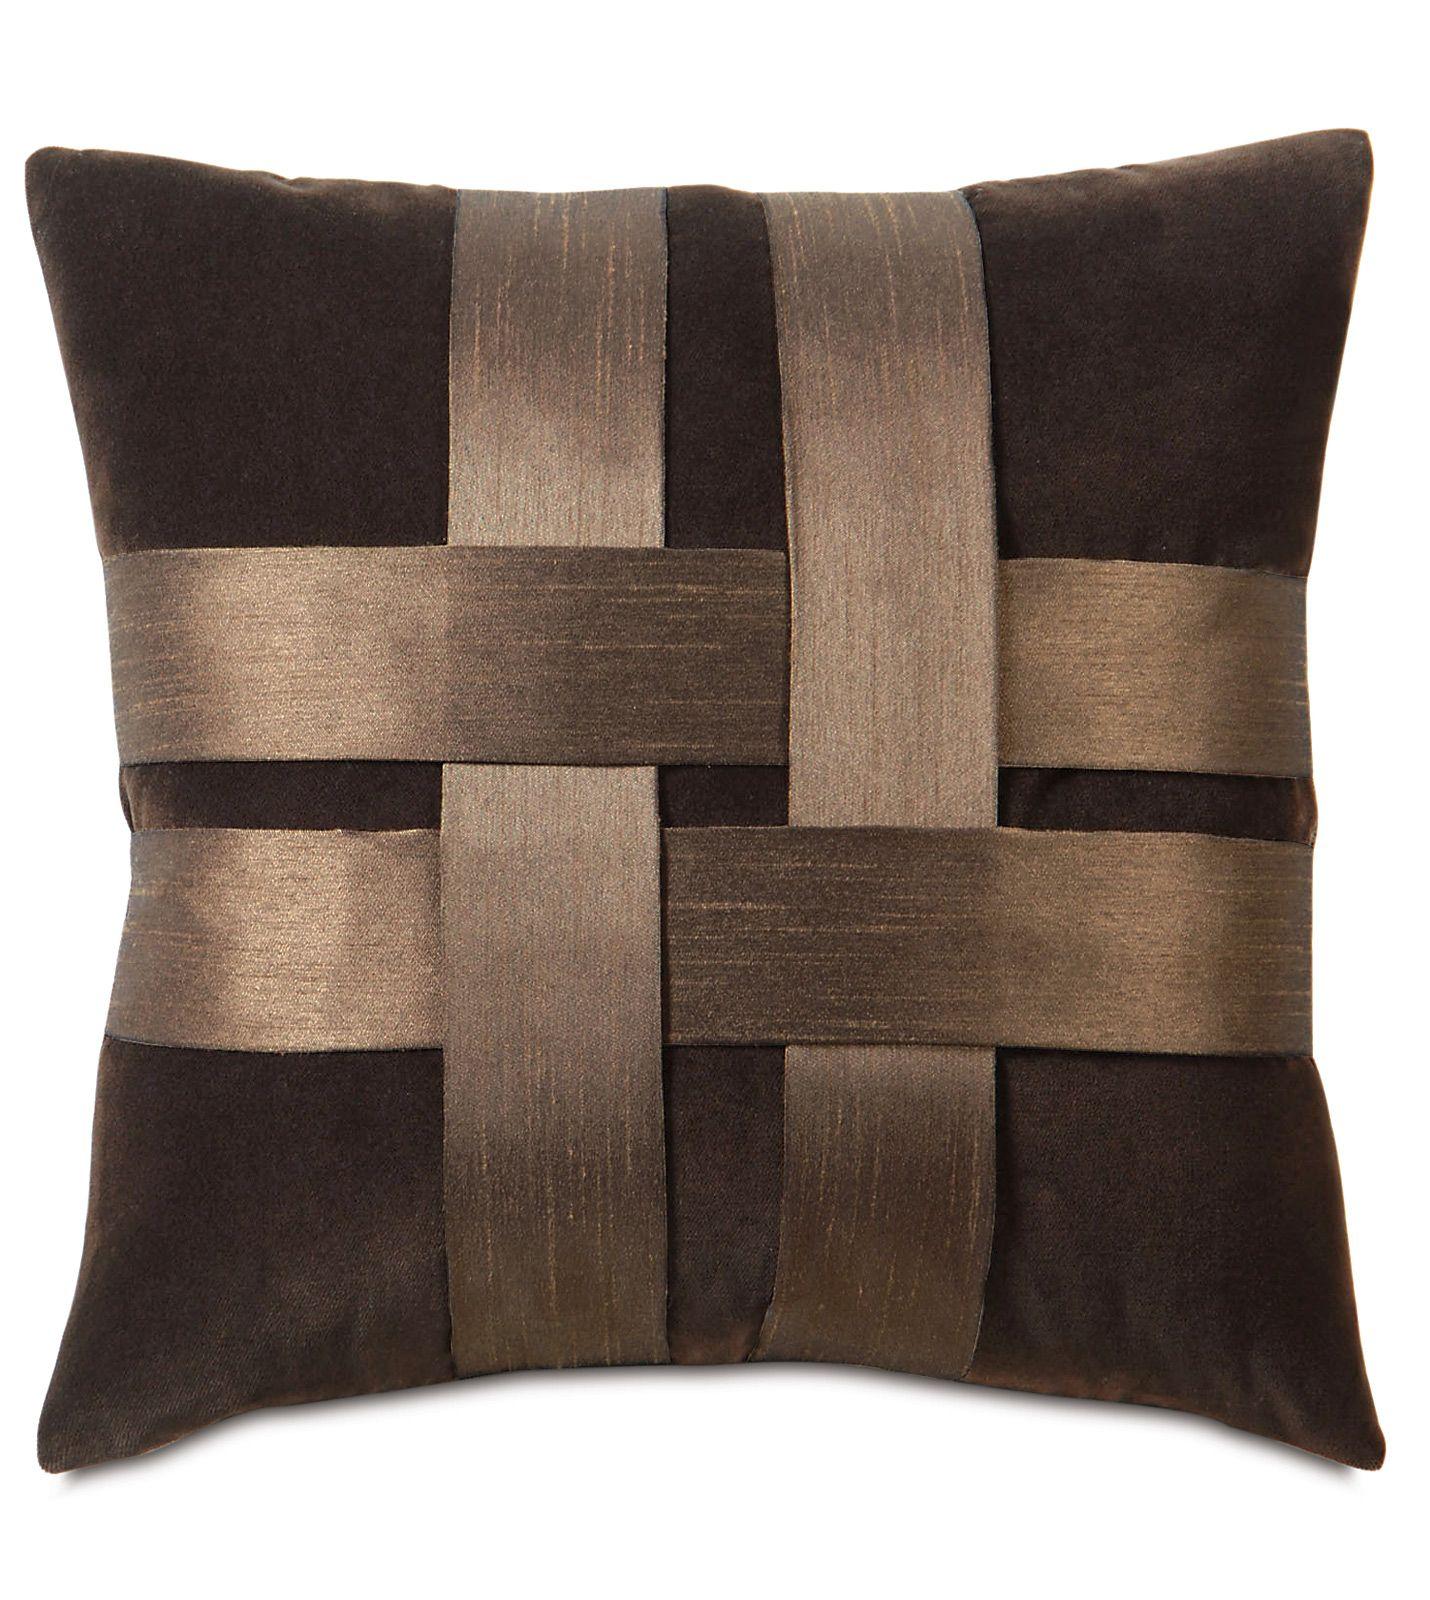 decorative pillows   ADESSA ACCENT PILLOW A  Luxury